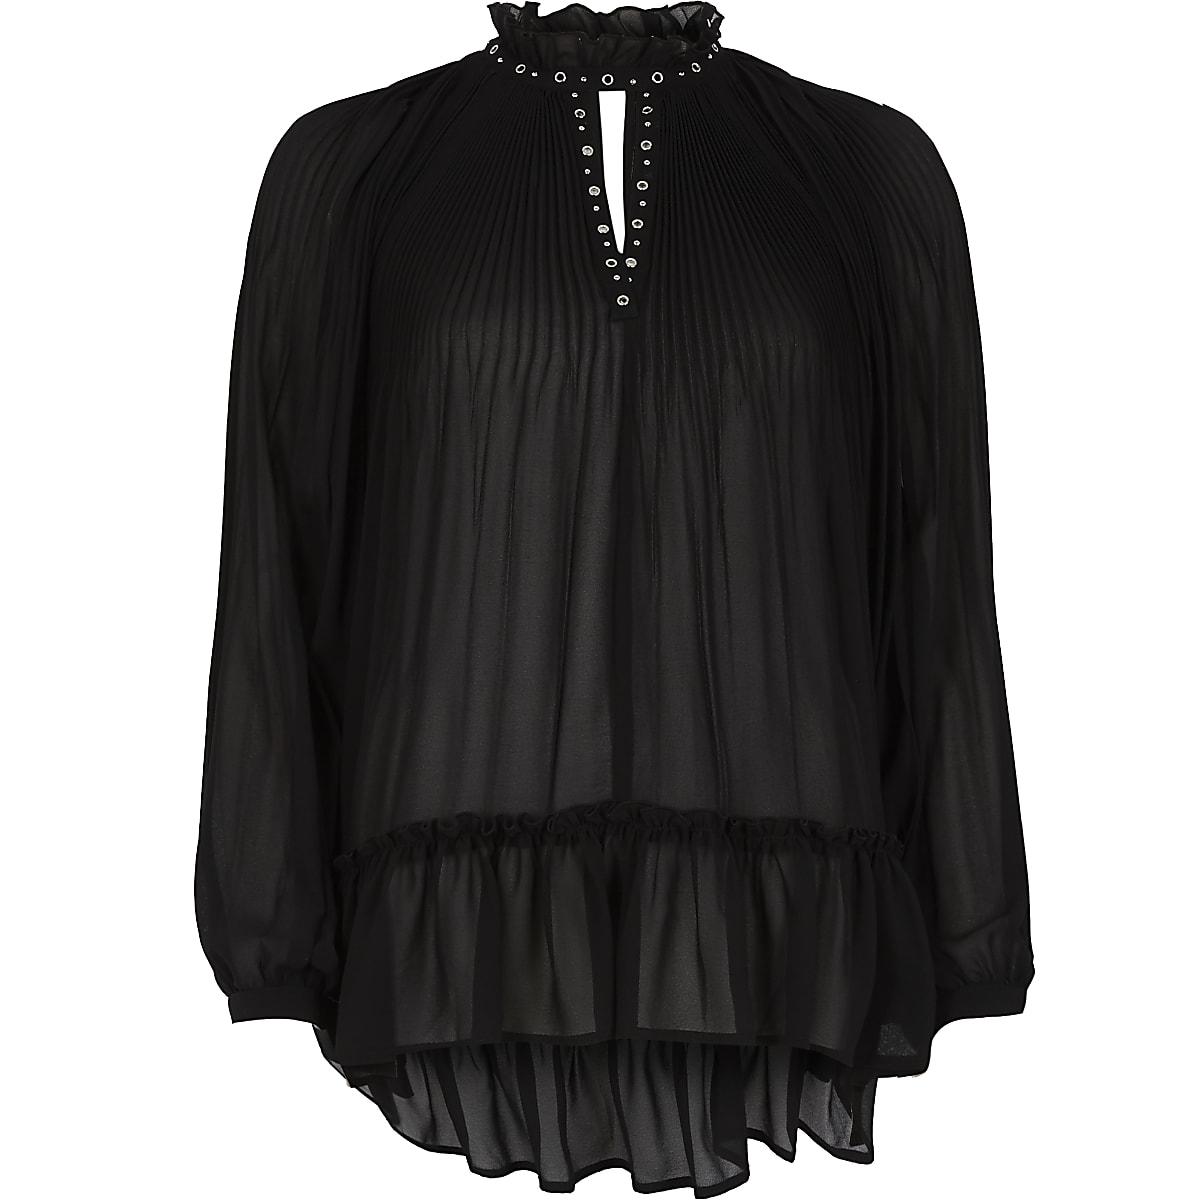 Black pleated eyelet high neck sheer blouse